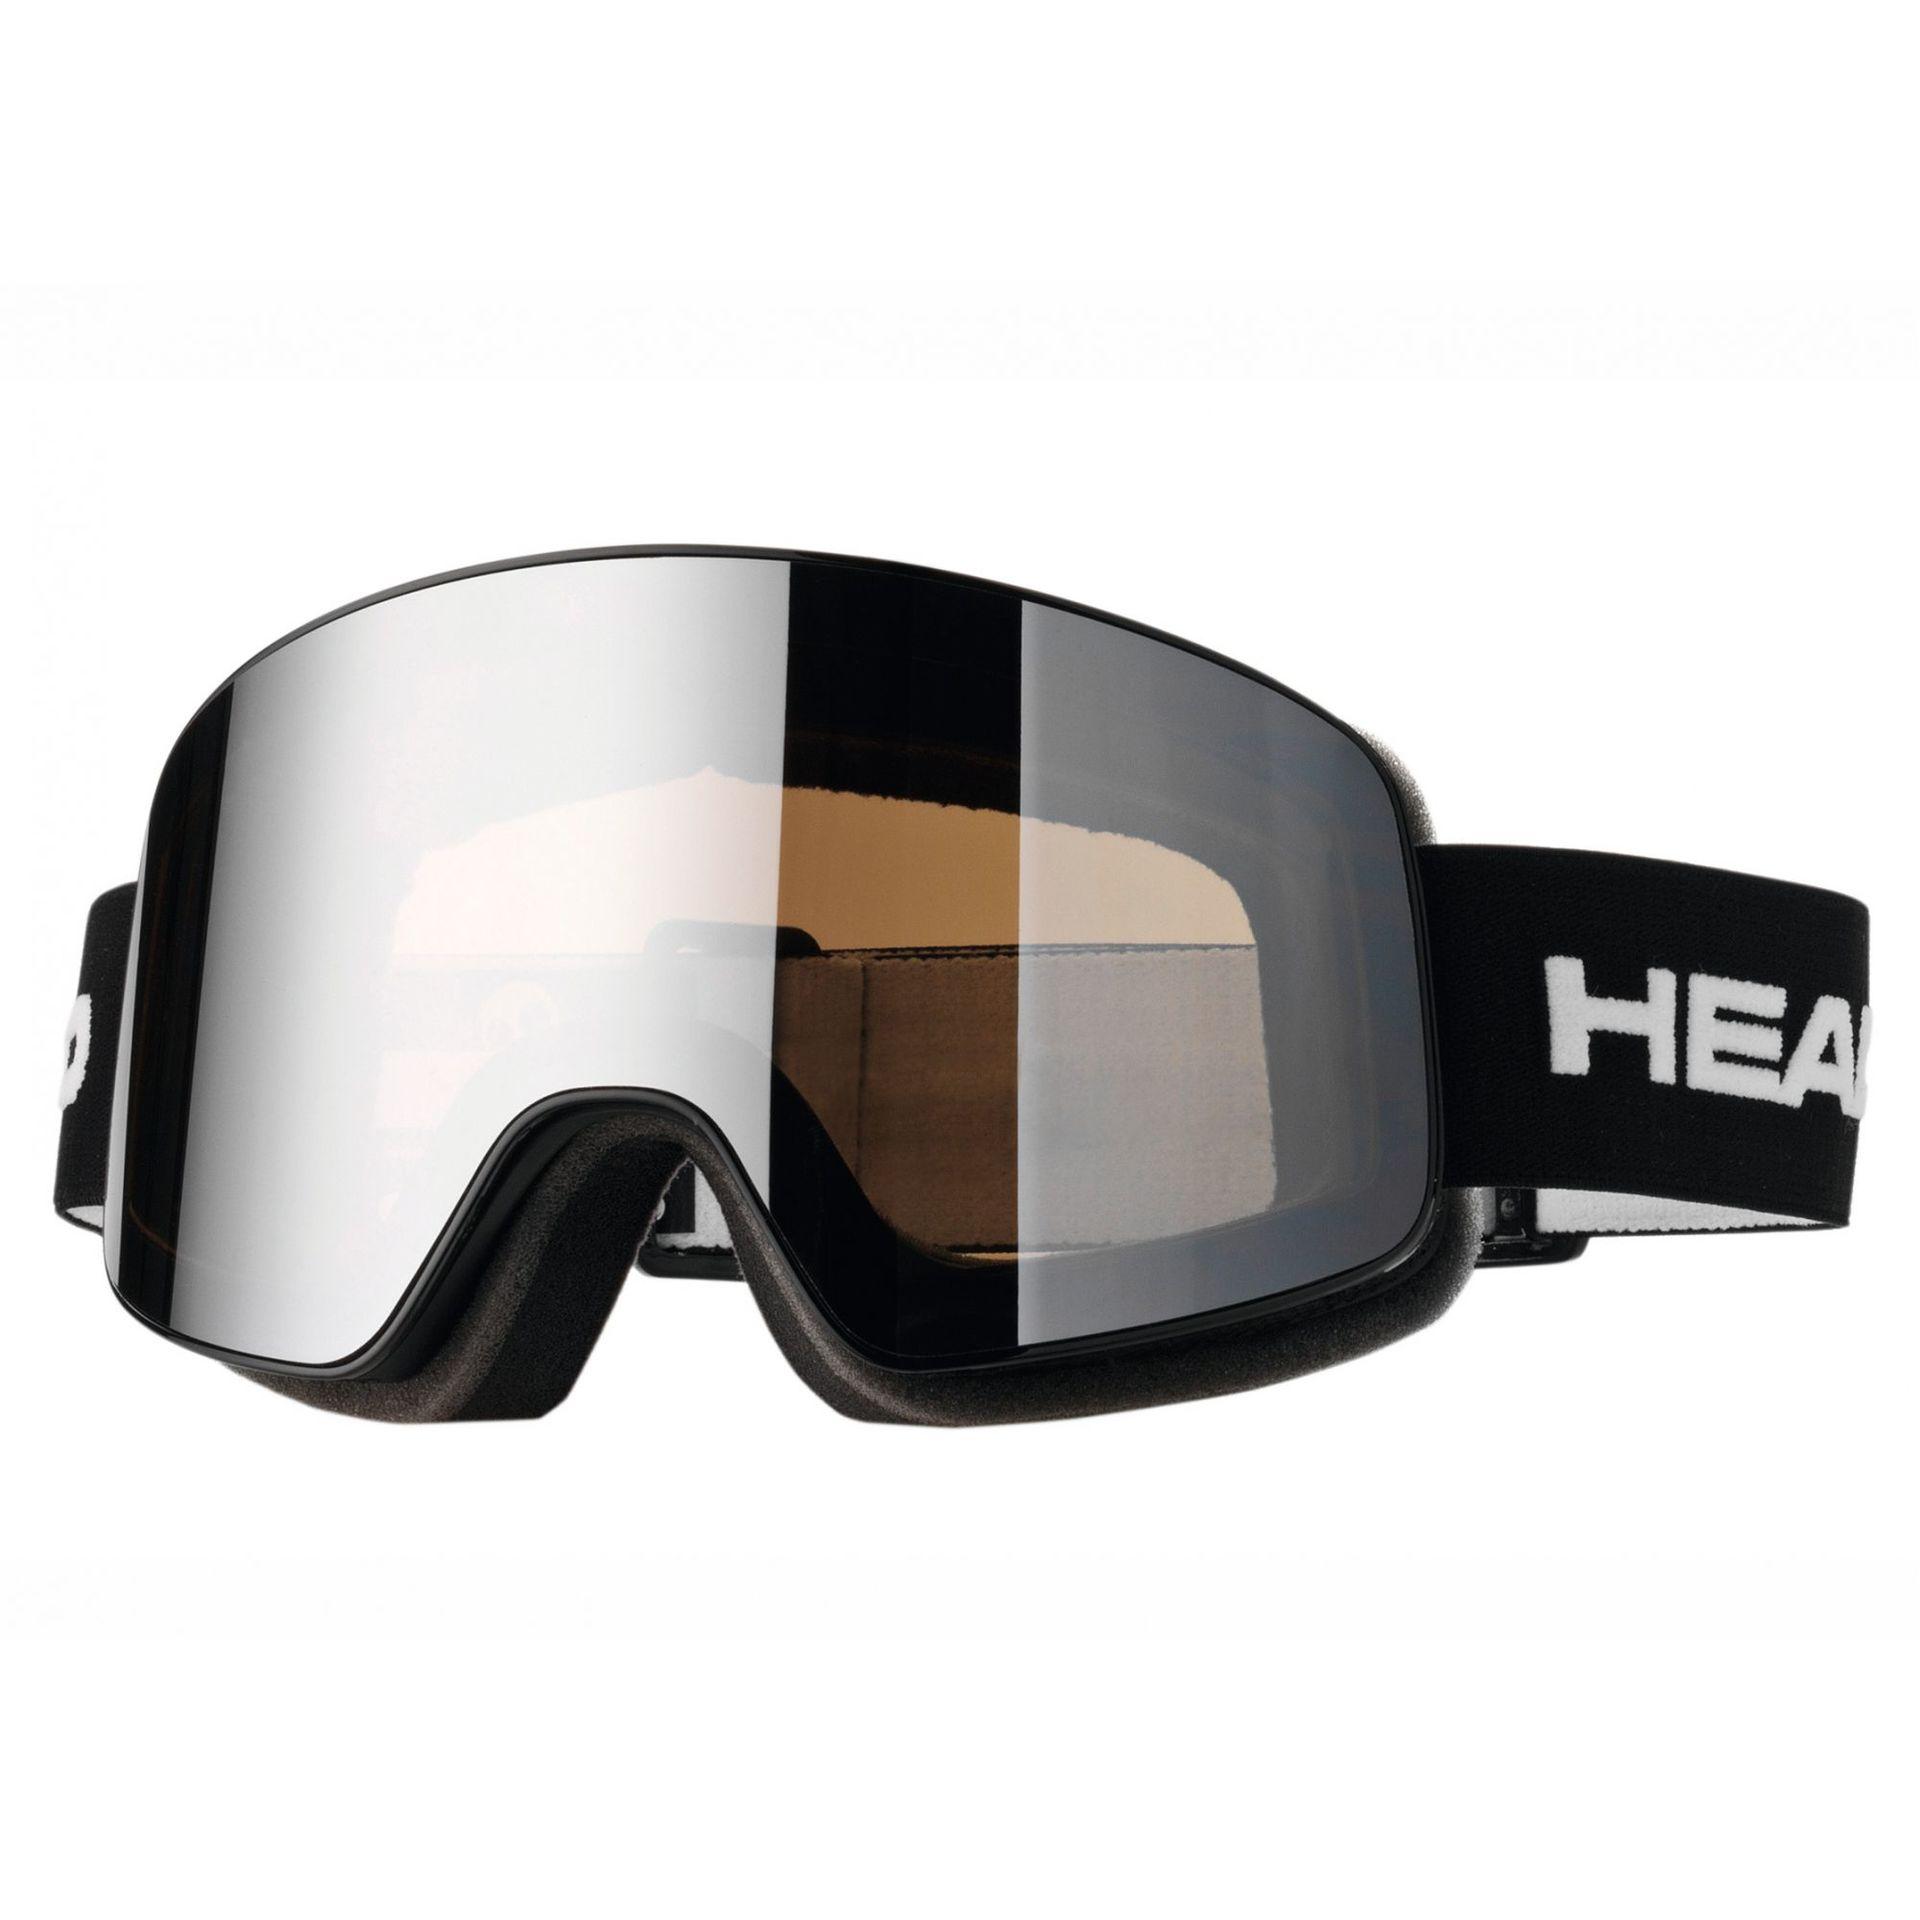 GOGLE HEAD HORIZON RACE BLACK